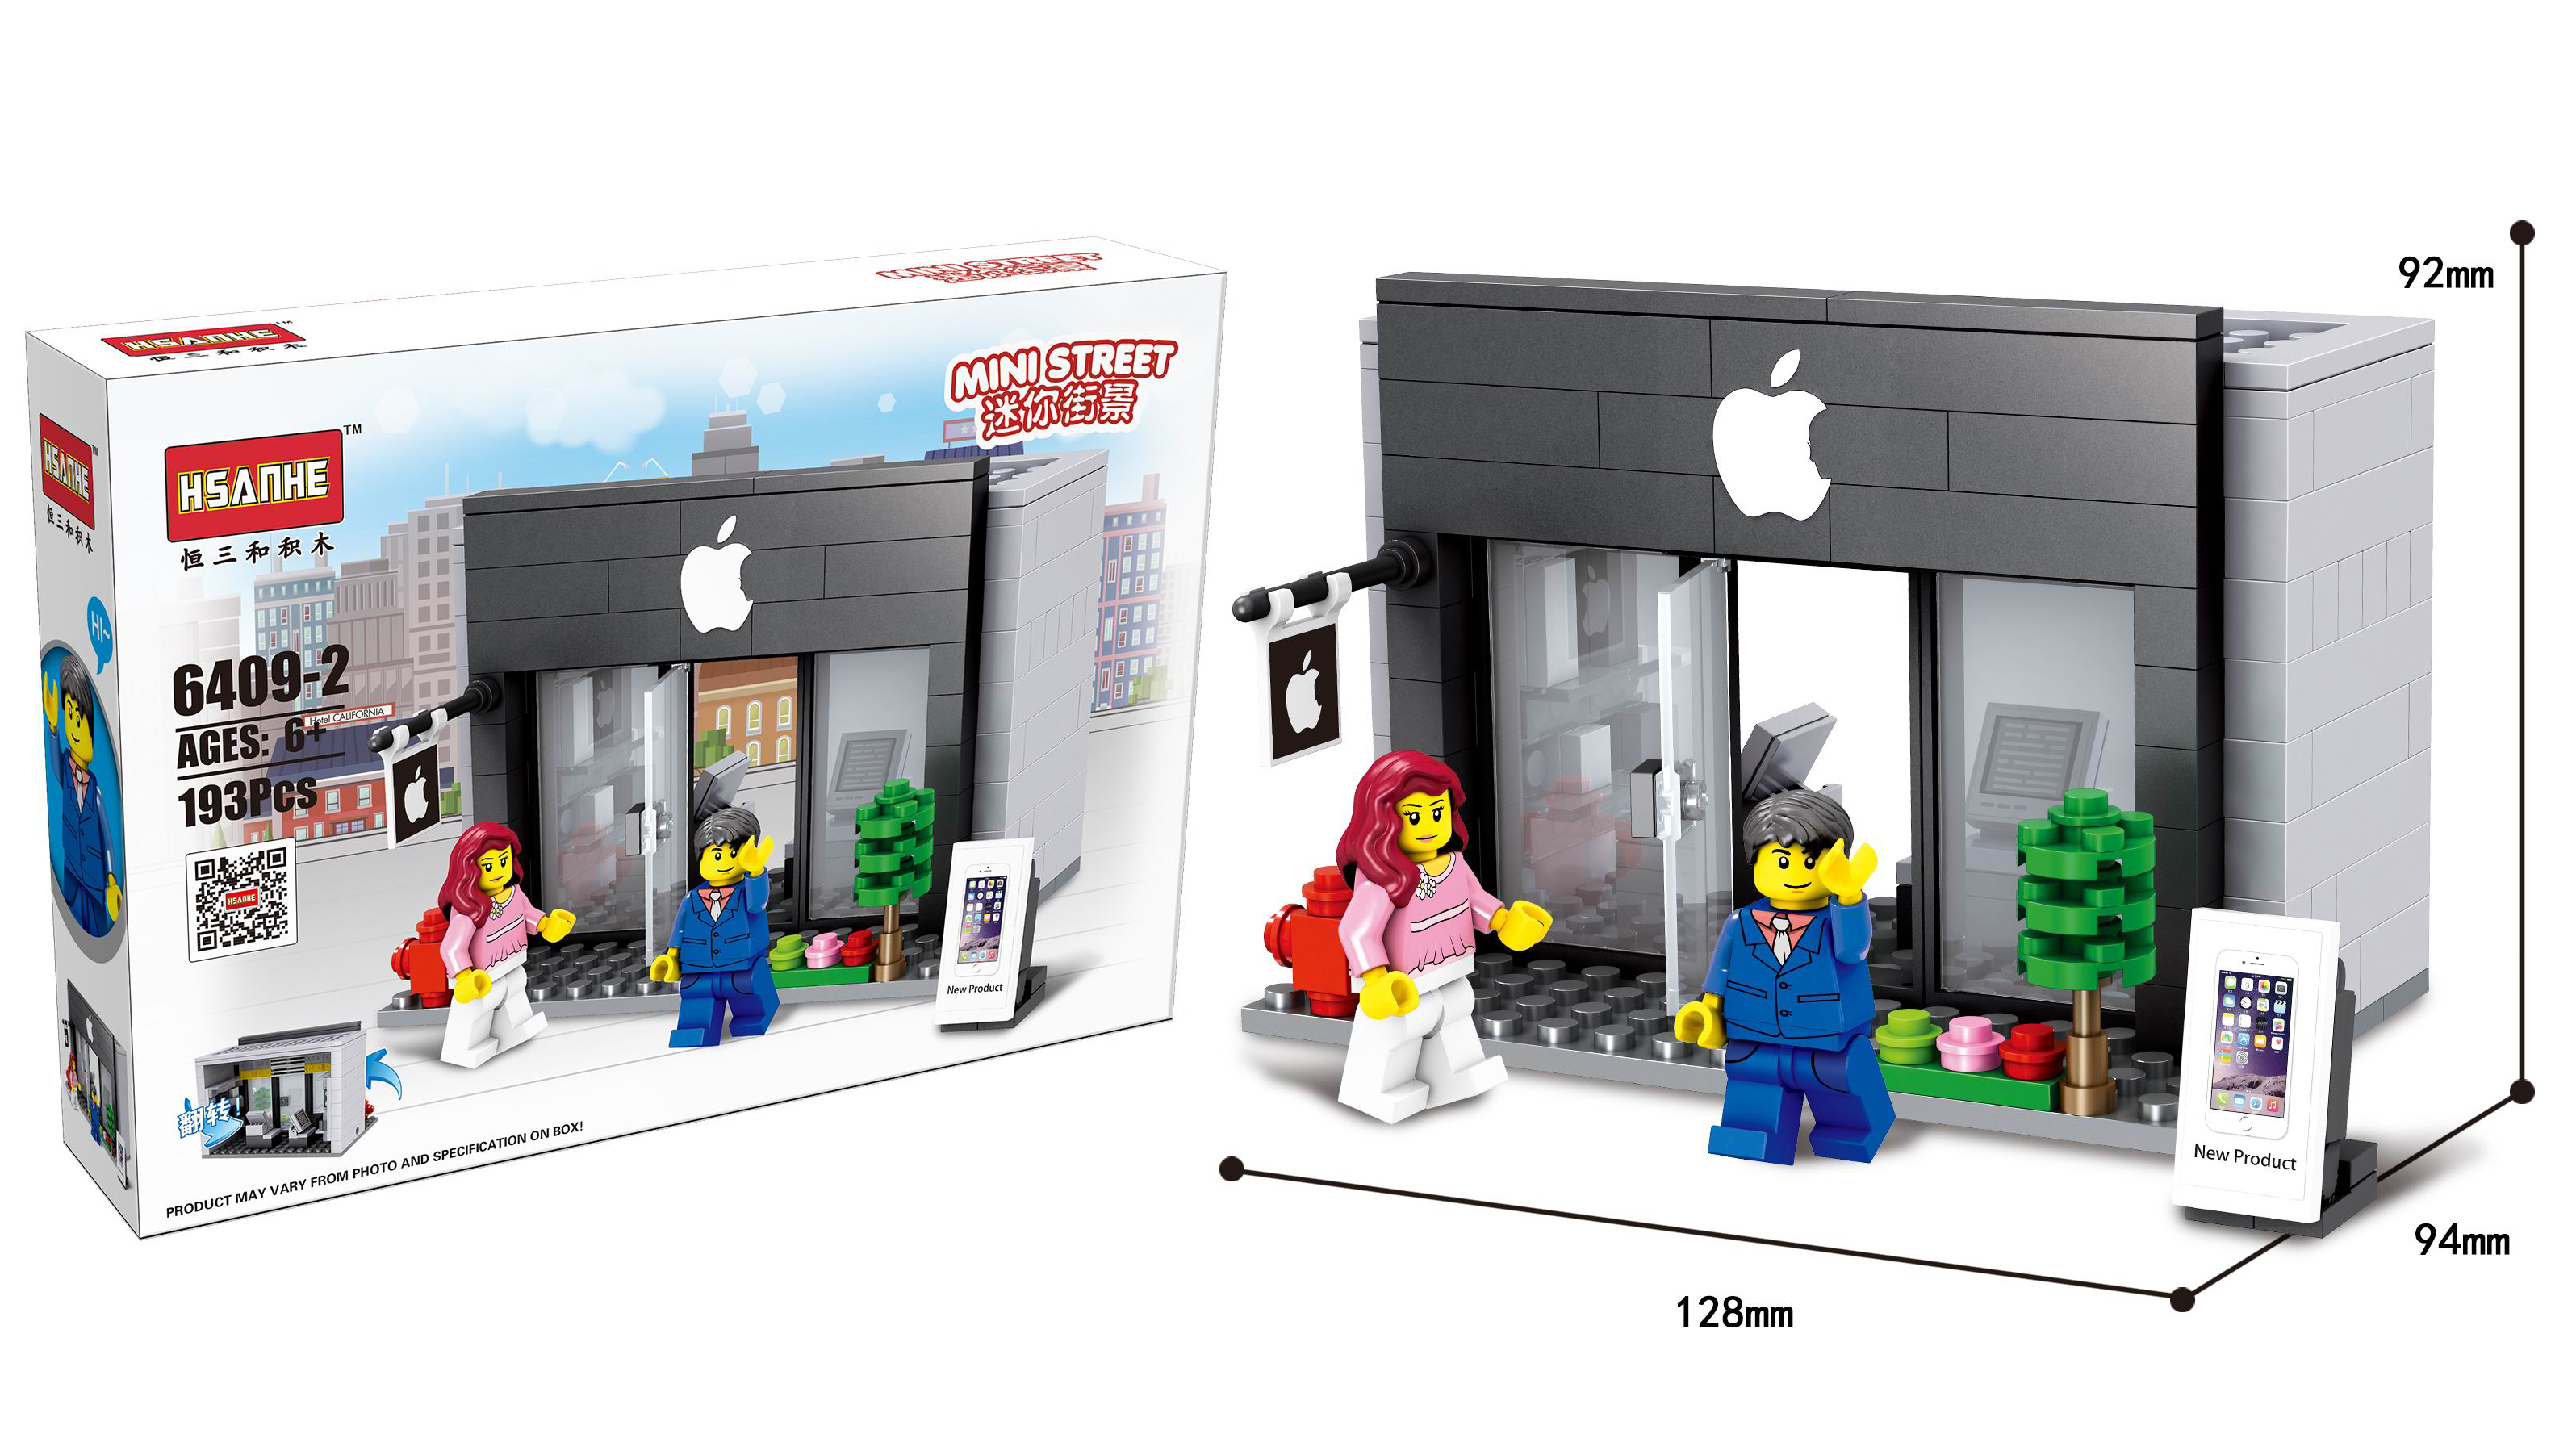 Mini Streetview bricks gift toy popular legoing stree tview kids building blocks toys Small particle street view blocks model